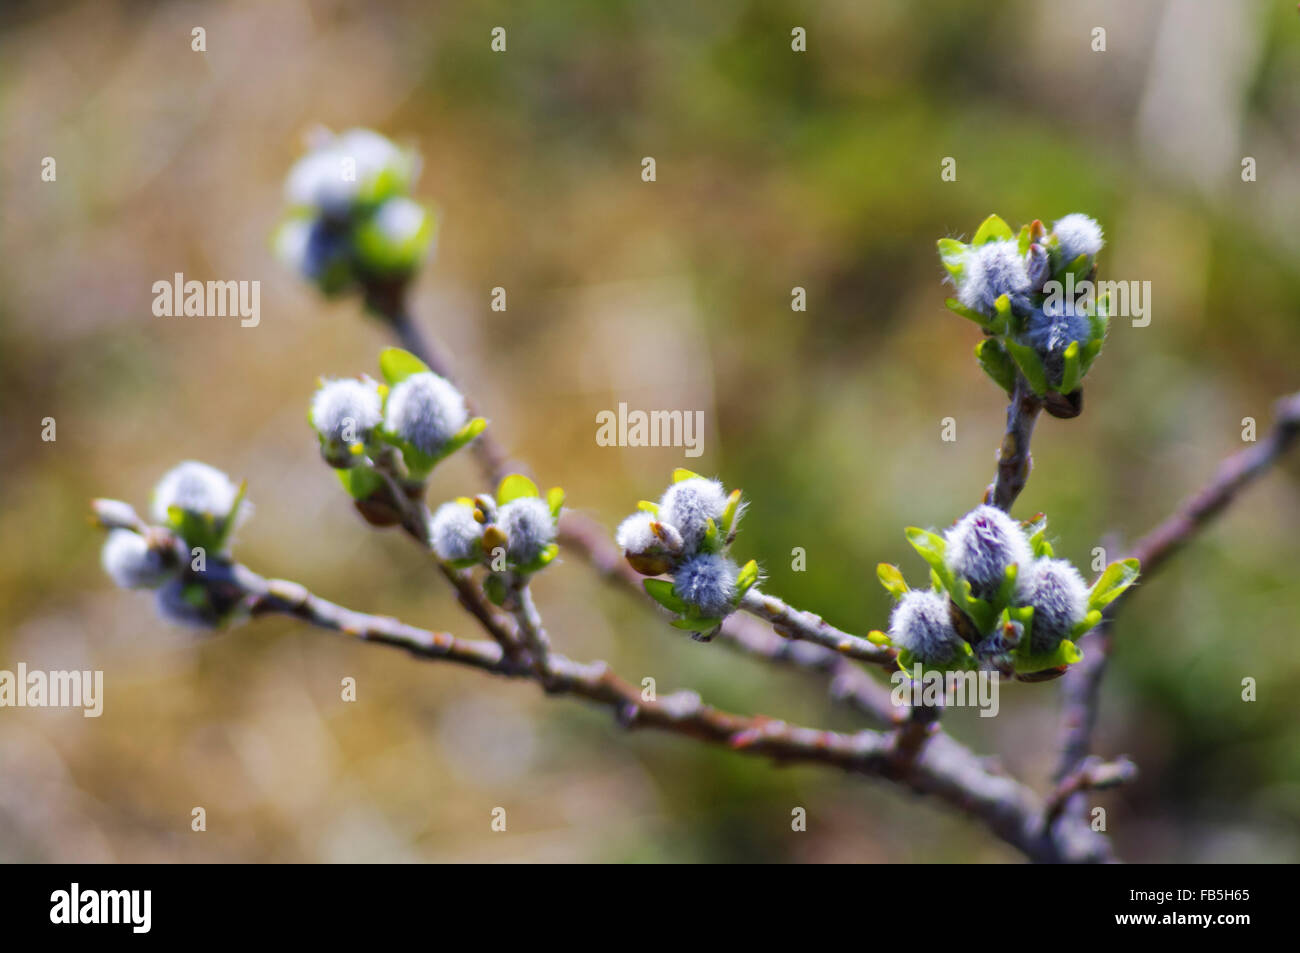 Twig of a deciduous bush in spring. Aleutian Islands, Alaska, USA. - Stock Image